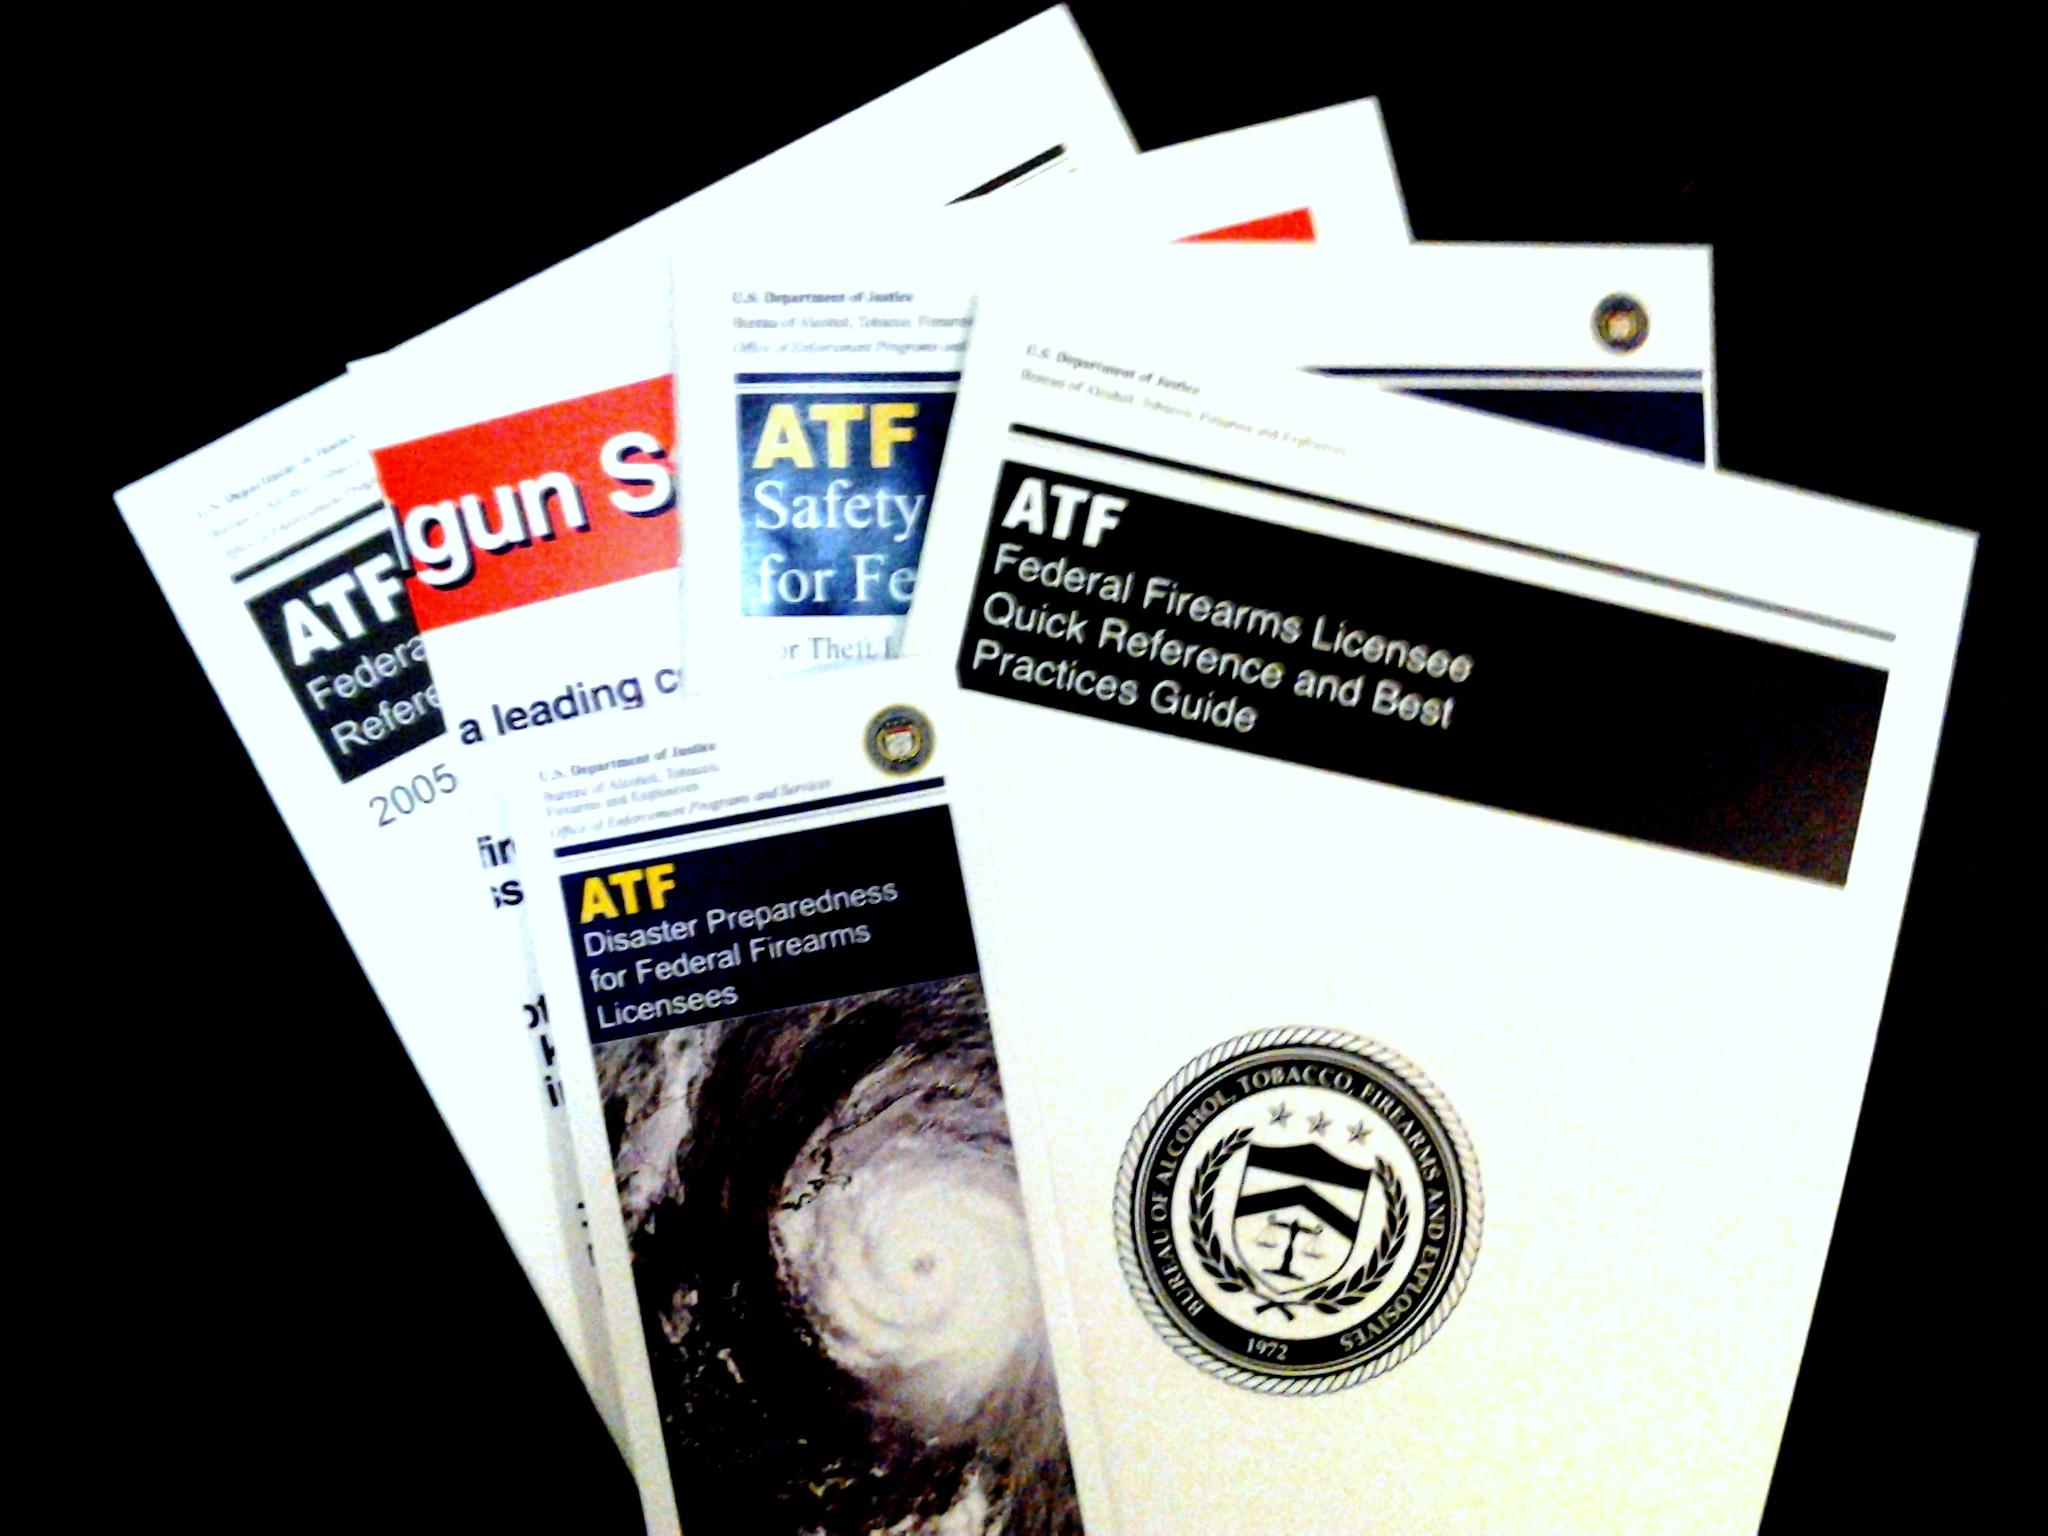 How to get an ffl license – rocketffl.